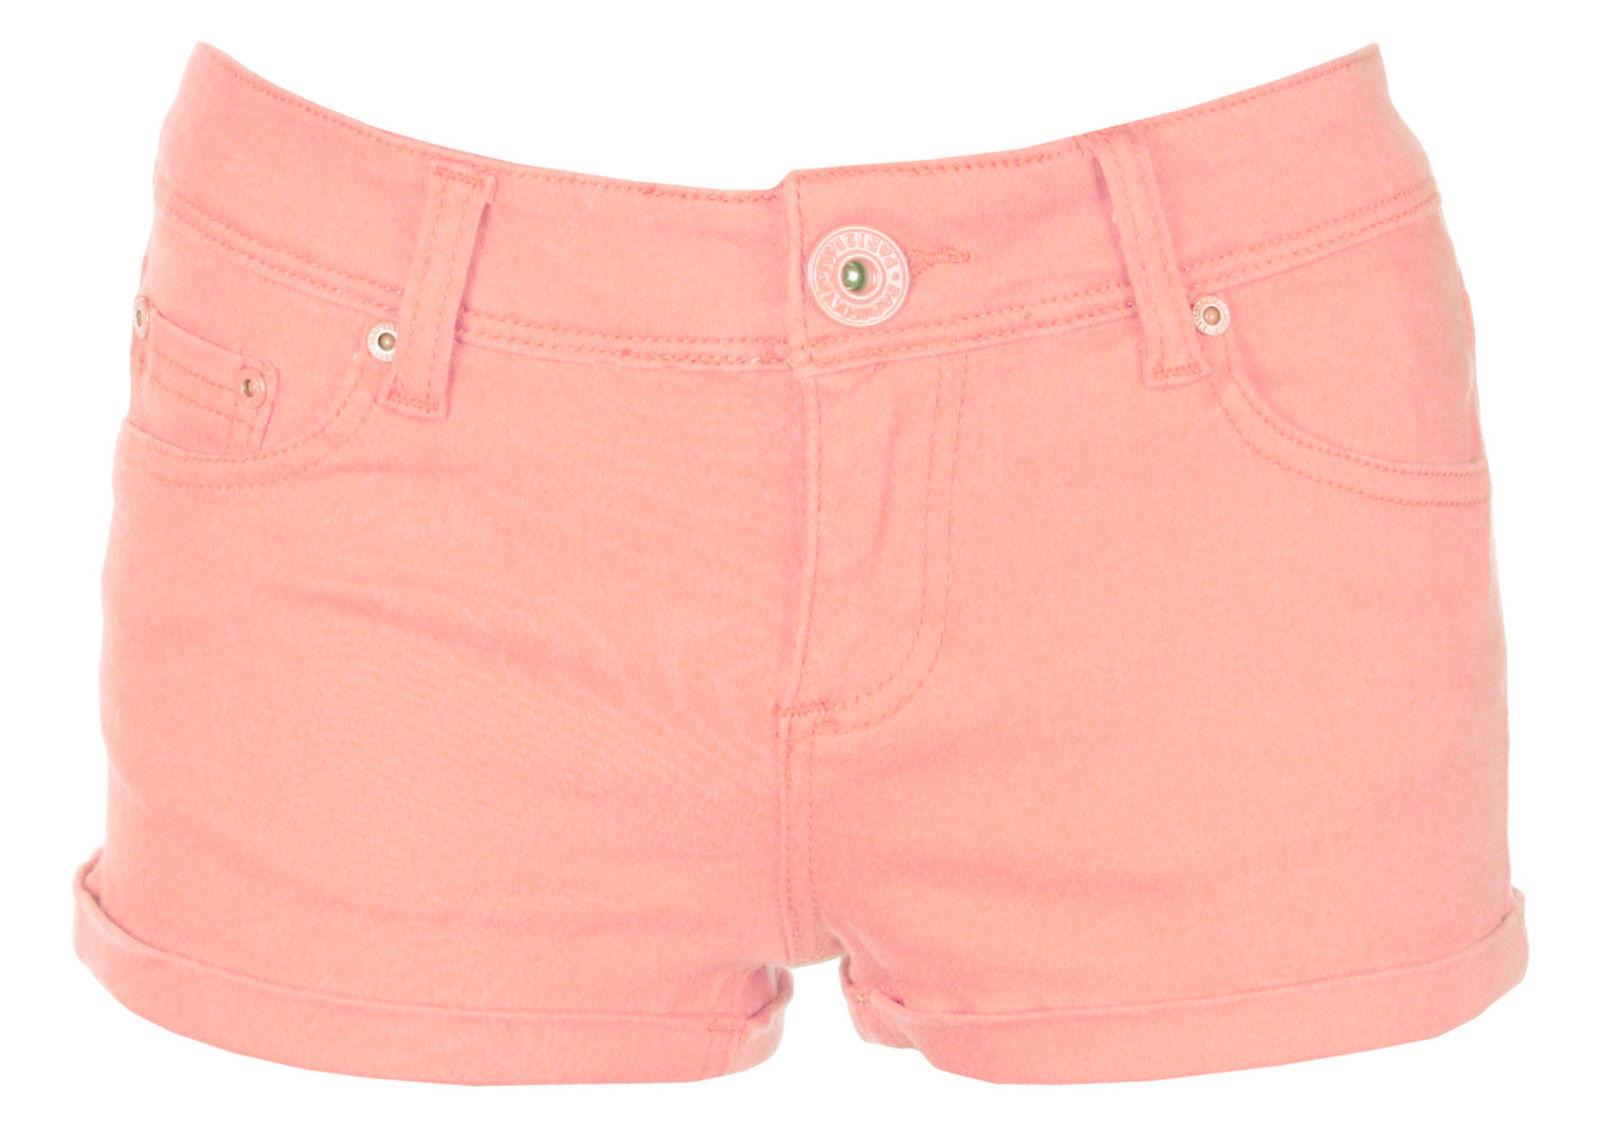 New-Femme-Basse-Taille-Couleur-Denim-Shorty-Short-Jeans-Femme-Taille-6-8-10-12